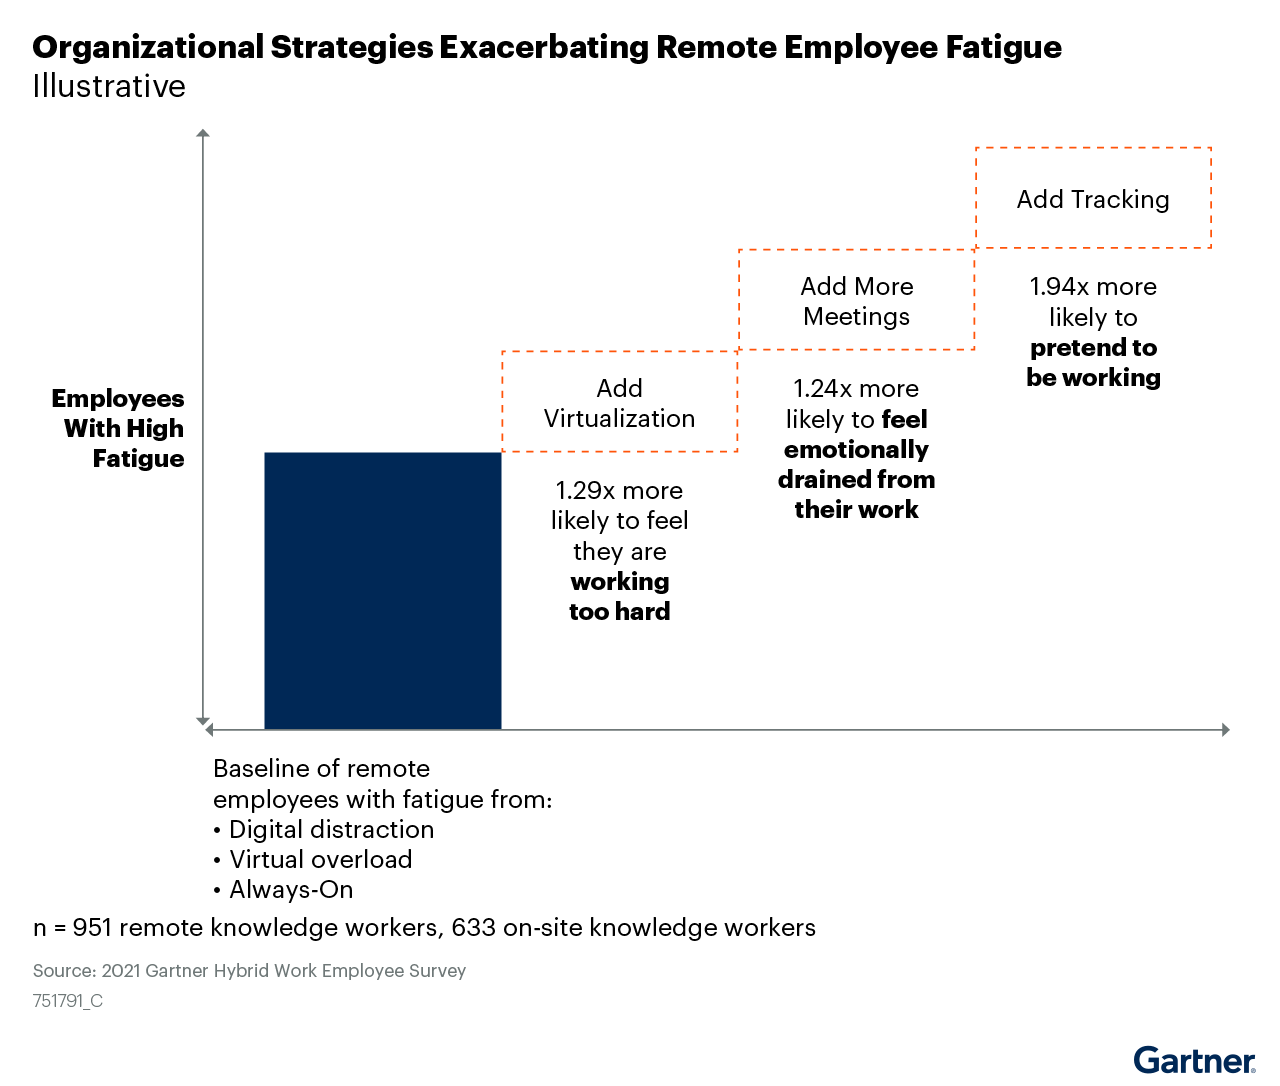 Figure 2: Organizational Strategies Exacerbating Remote Employee Fatigue